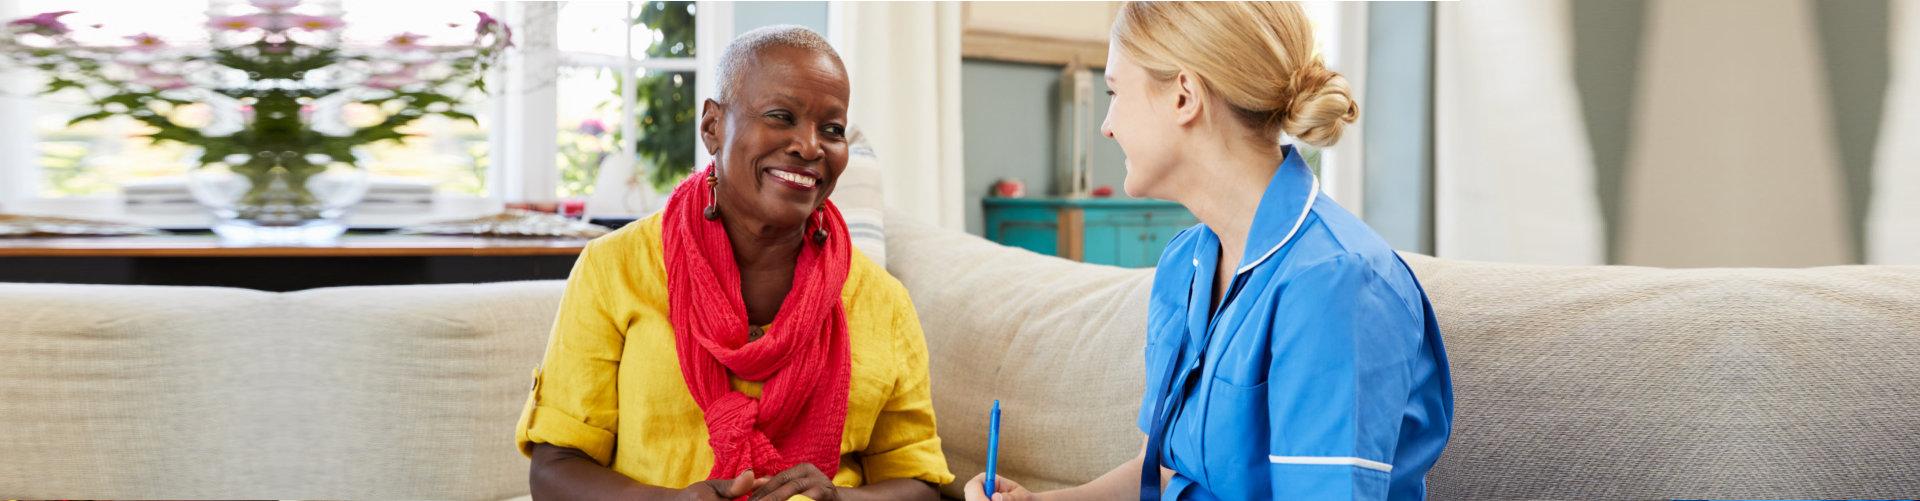 caregiver and senior woman talking